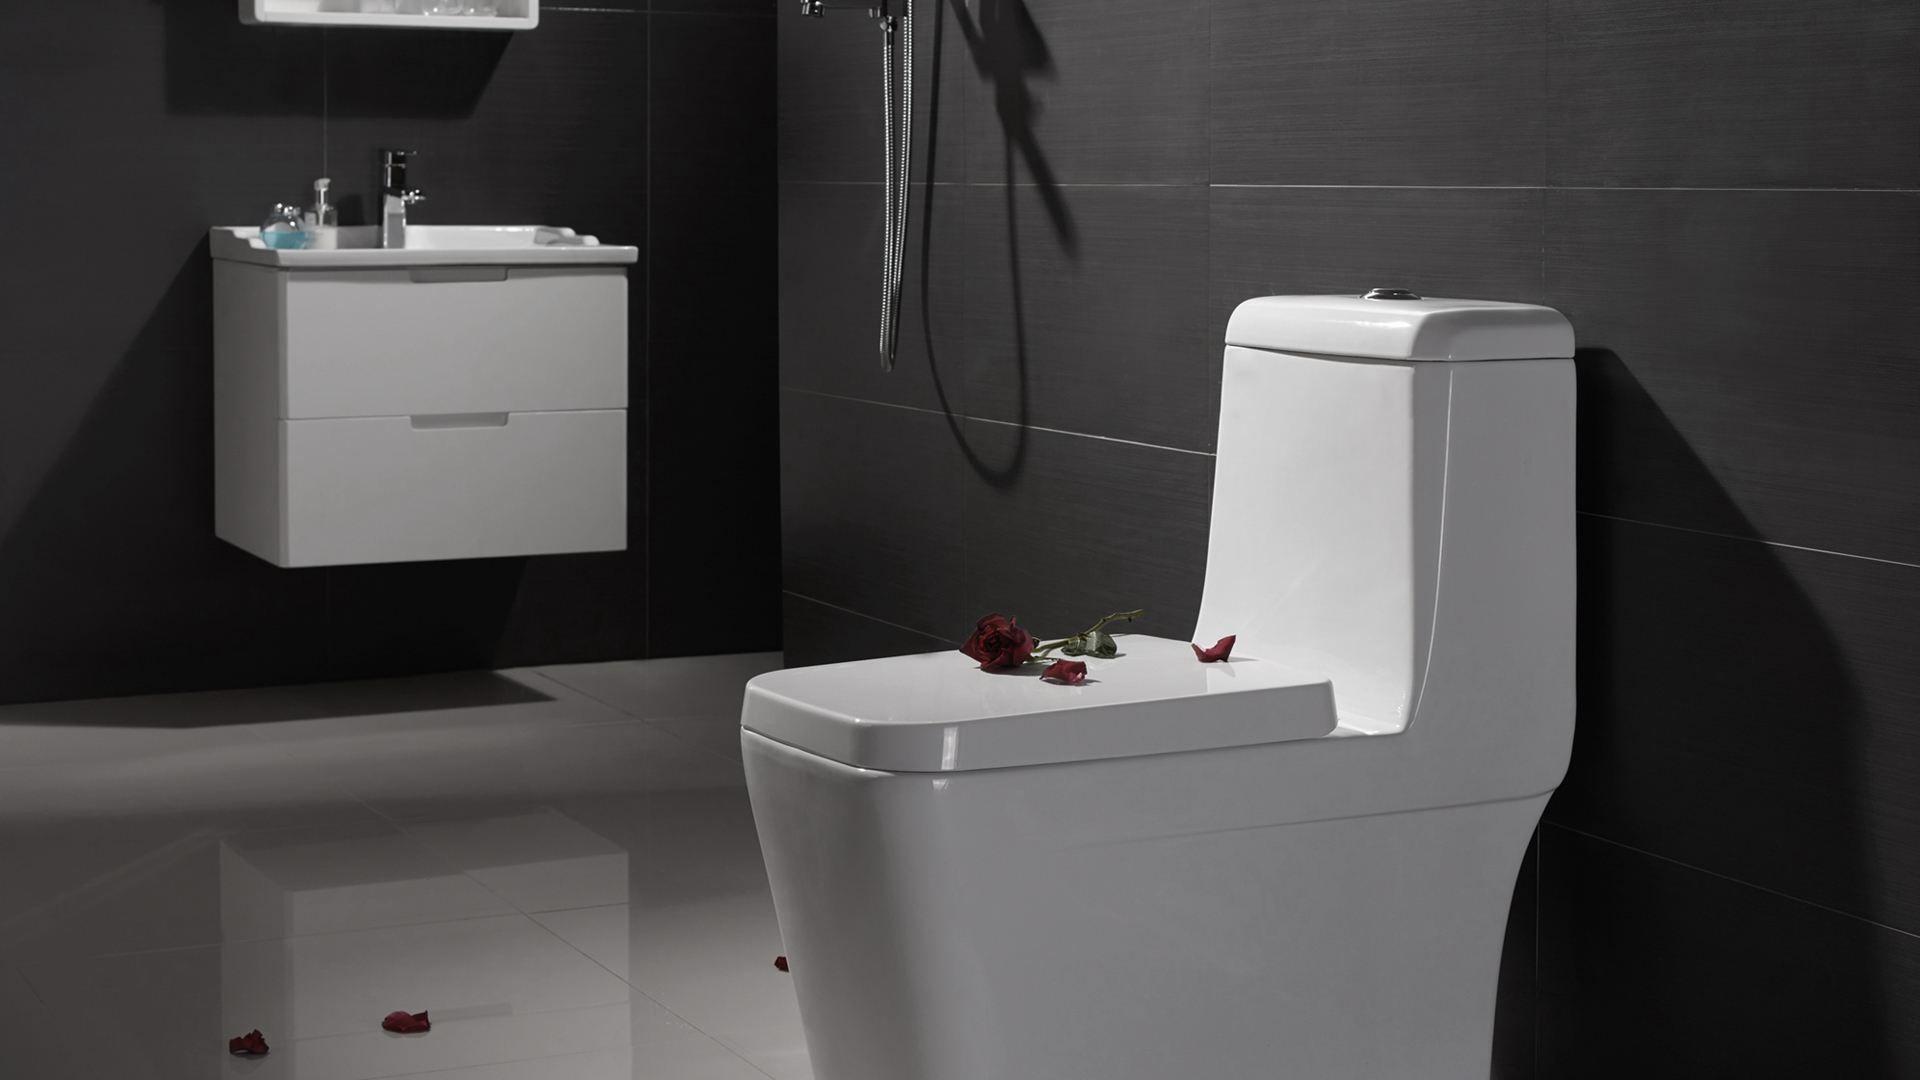 Badezimmer Wand ~ Produktfotografie produktfoto bad toilette wc klo wand wc